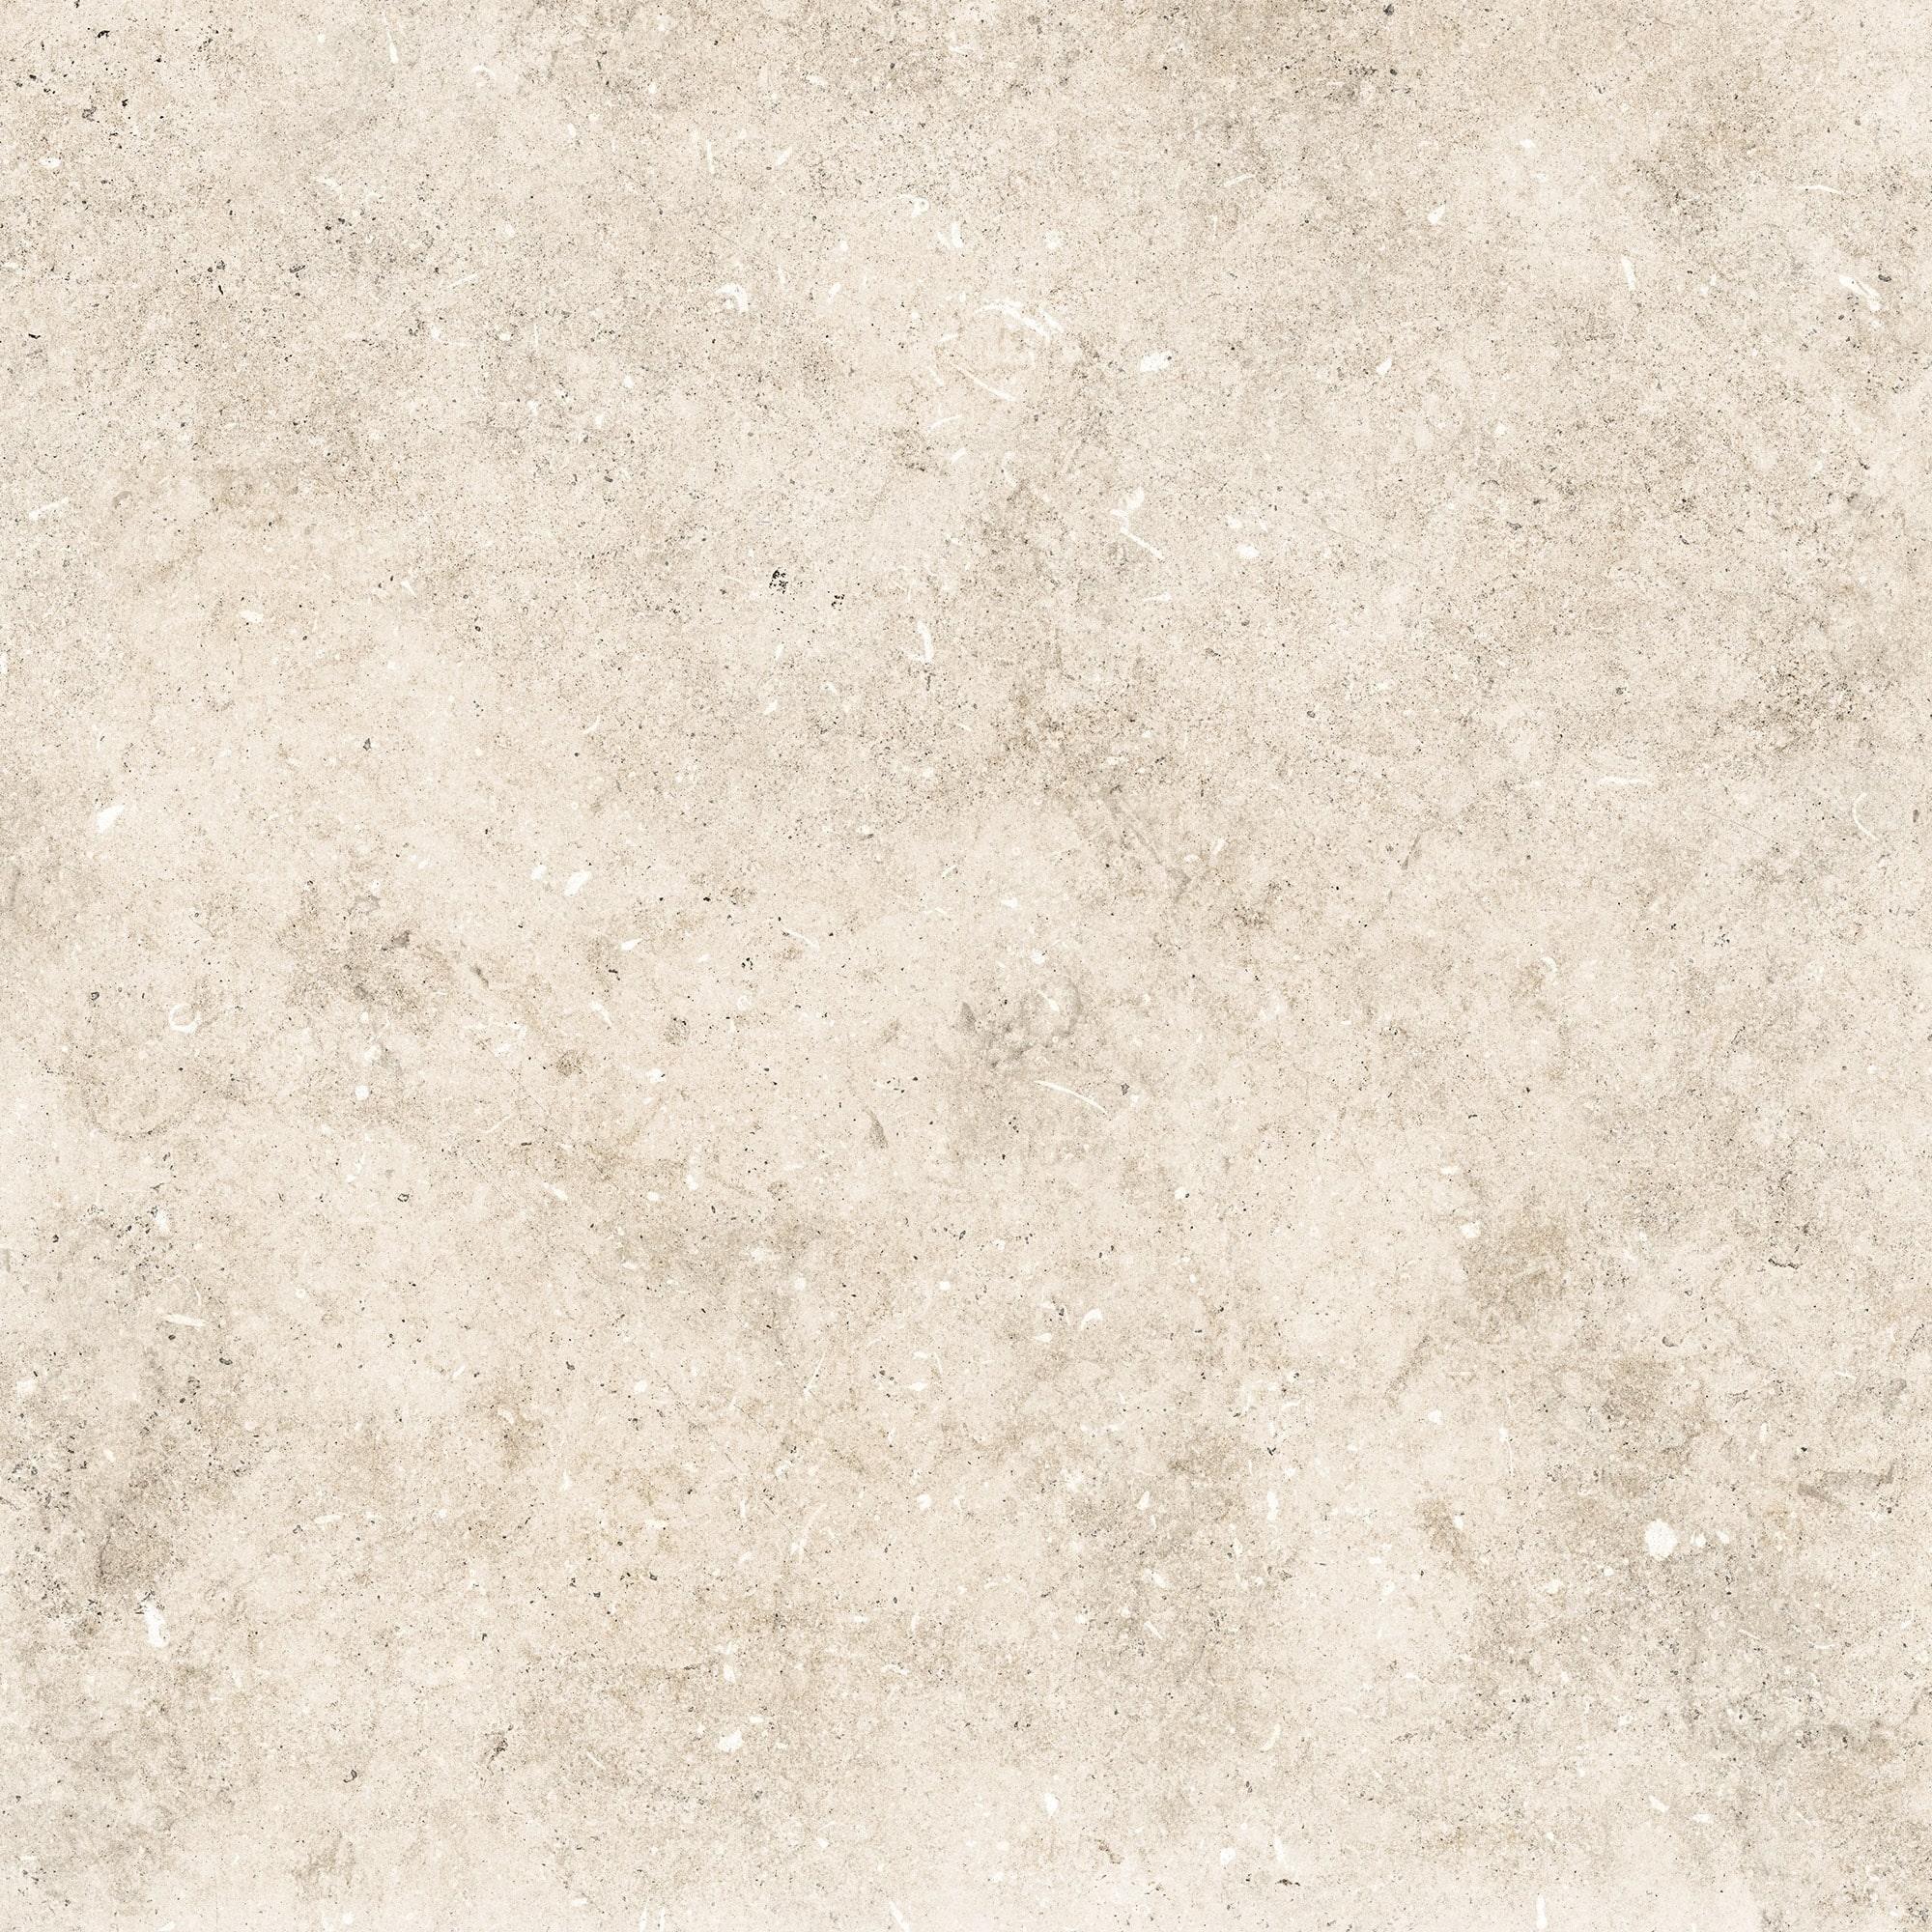 Плитка Керамин Авалон 3 50x50 см